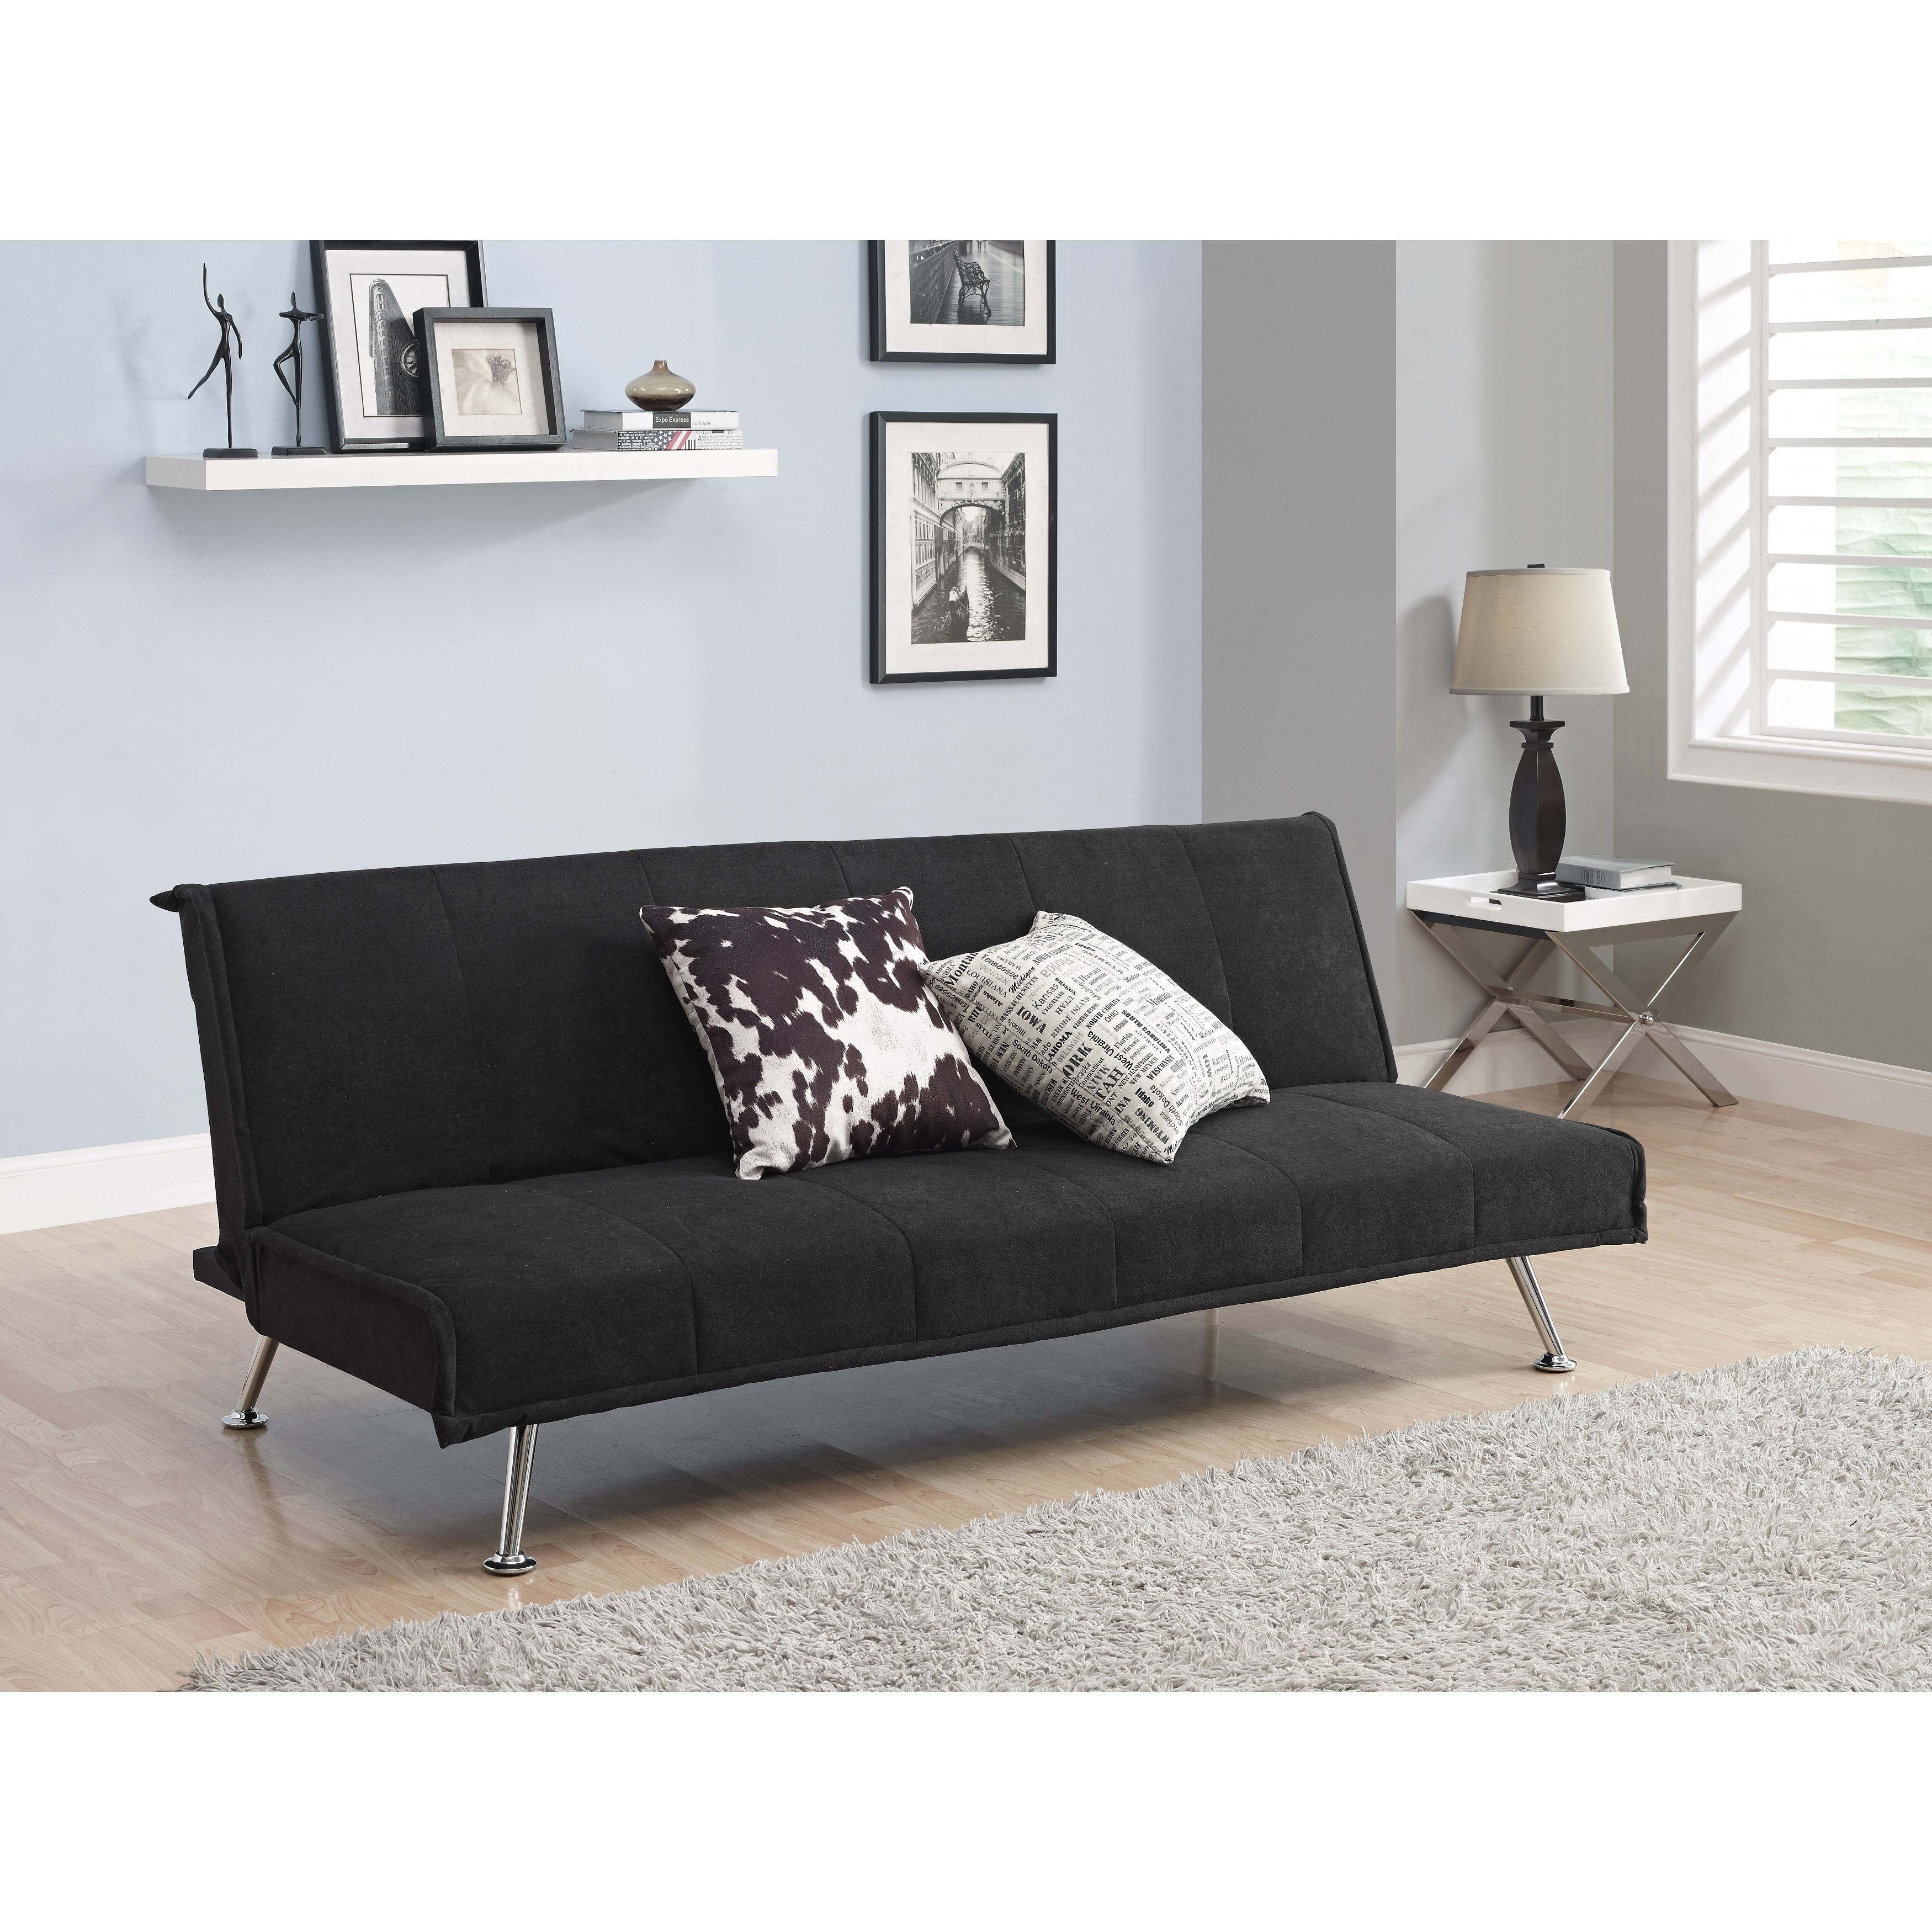 Kmart Leather Sofa